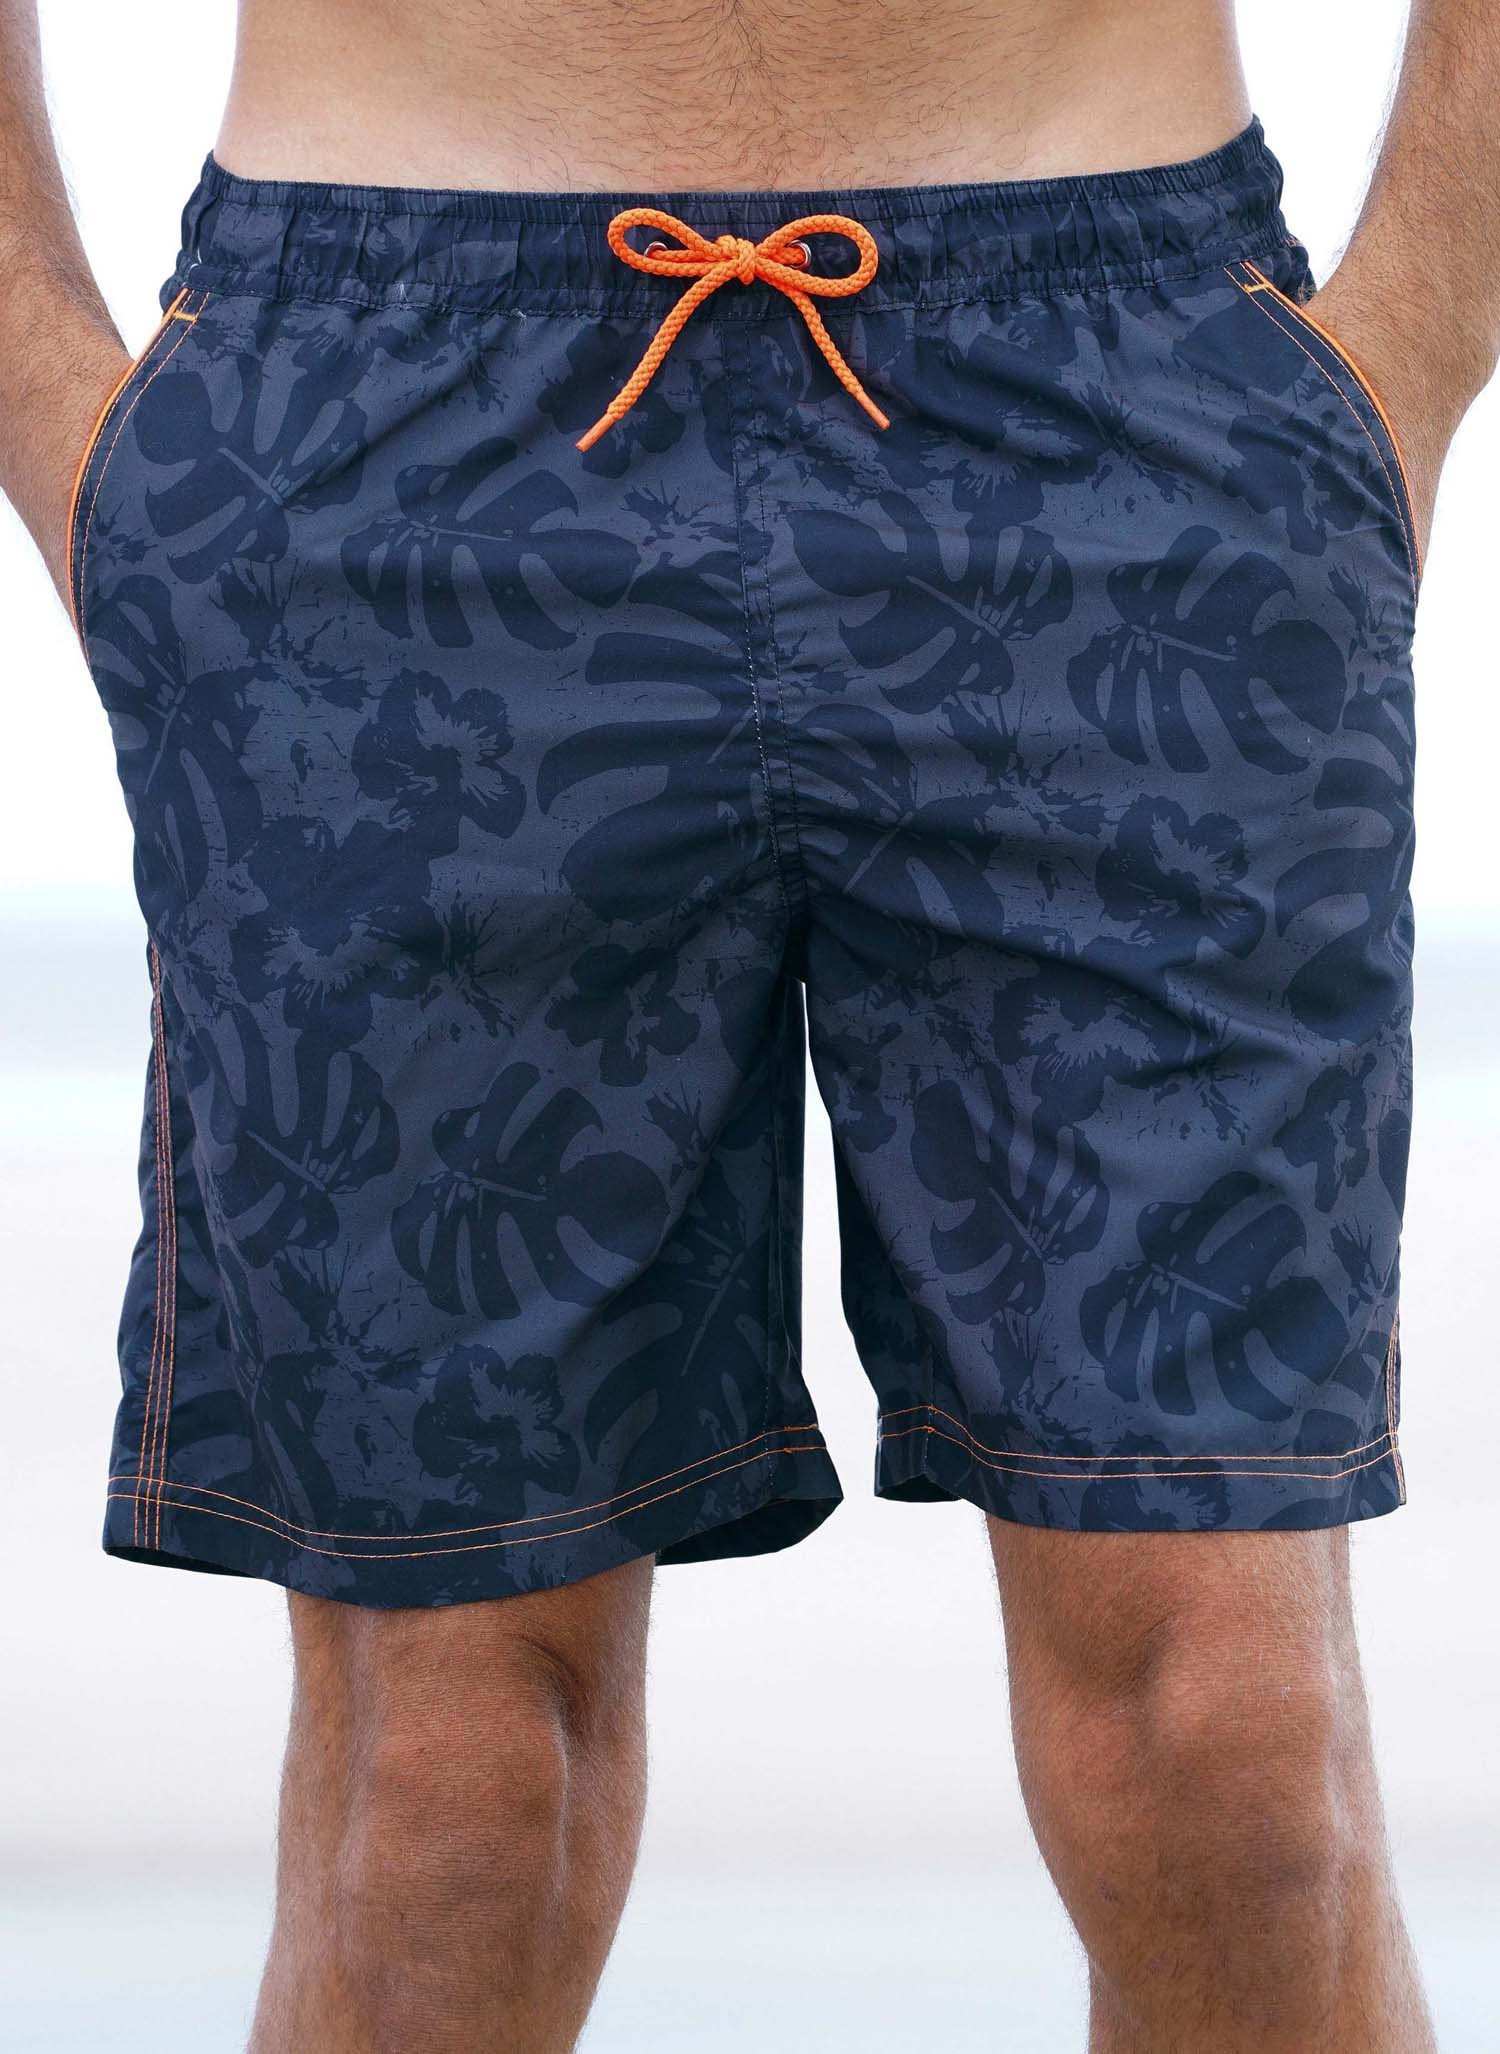 H-Bade-Shorts,Blatter, marine L 010 - 1 - Ronja.ch